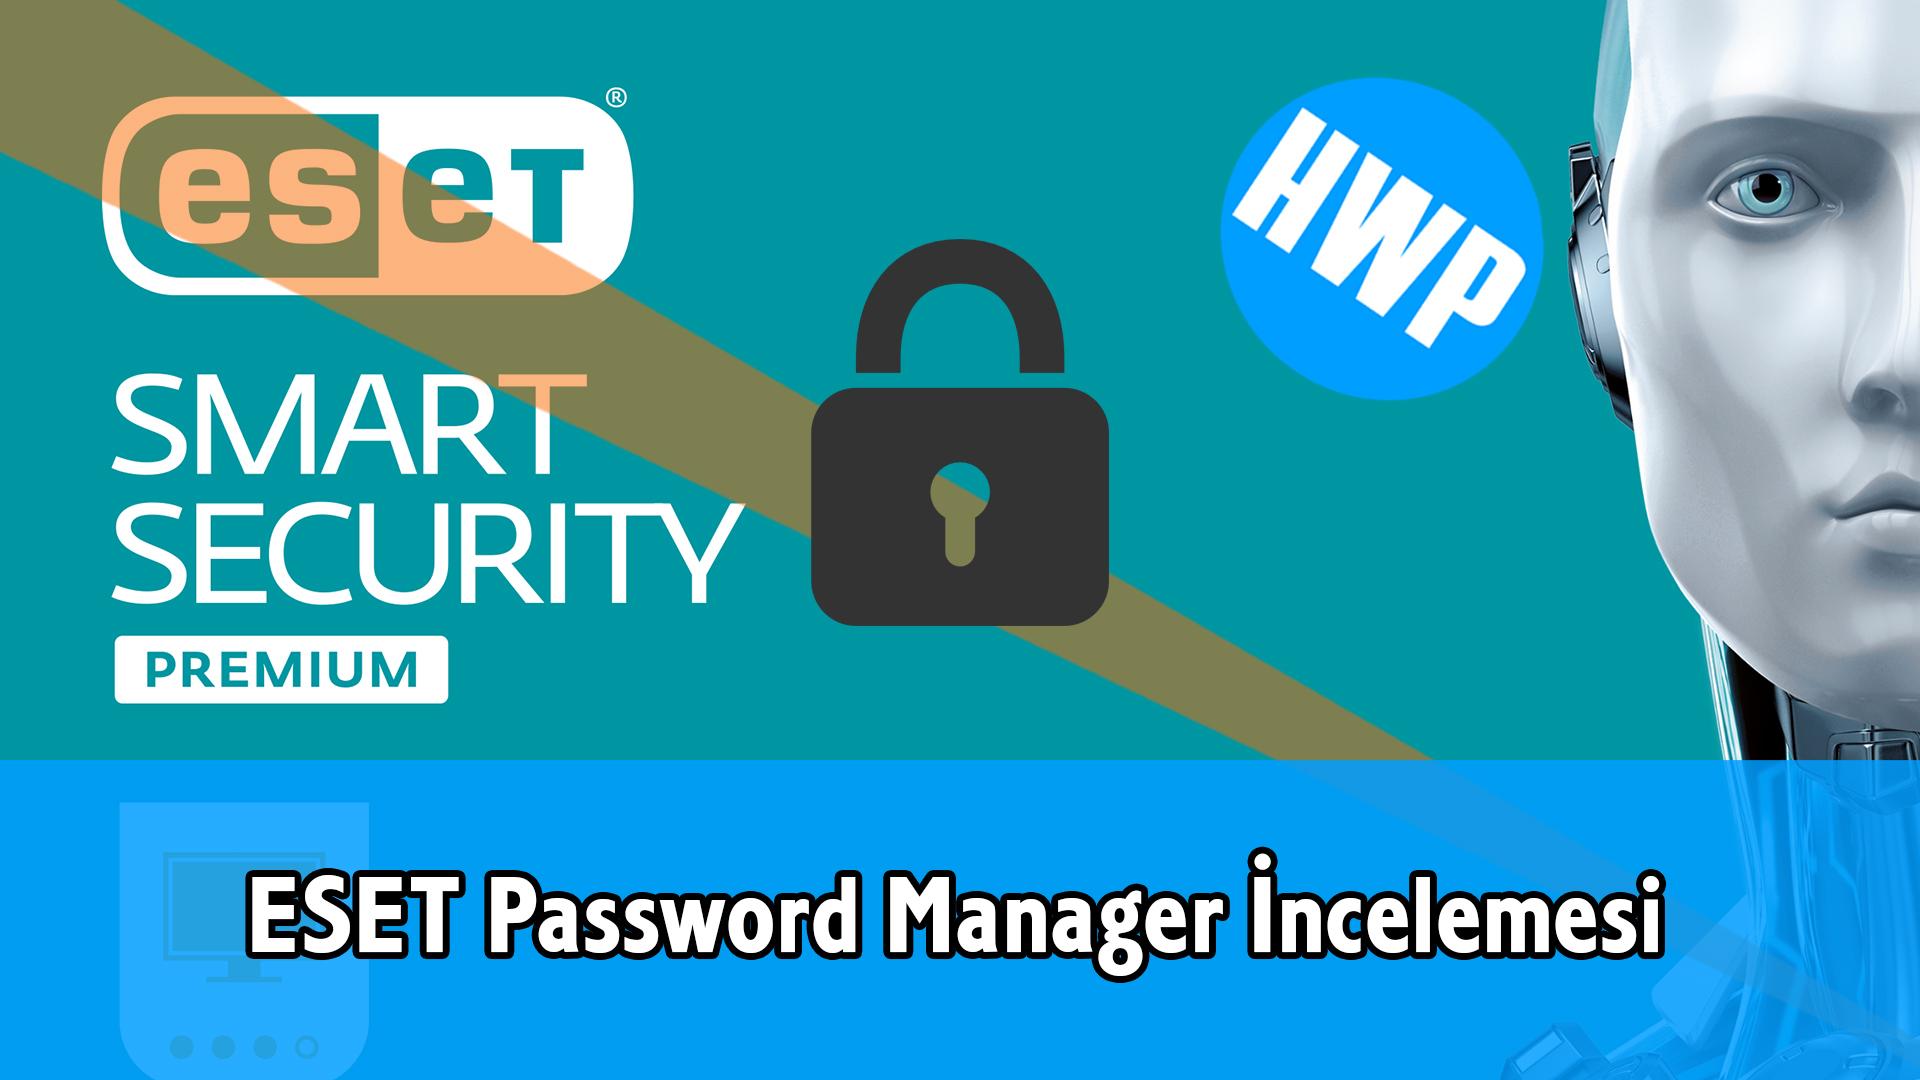 eset smart security premium password manager parola yöneticisi